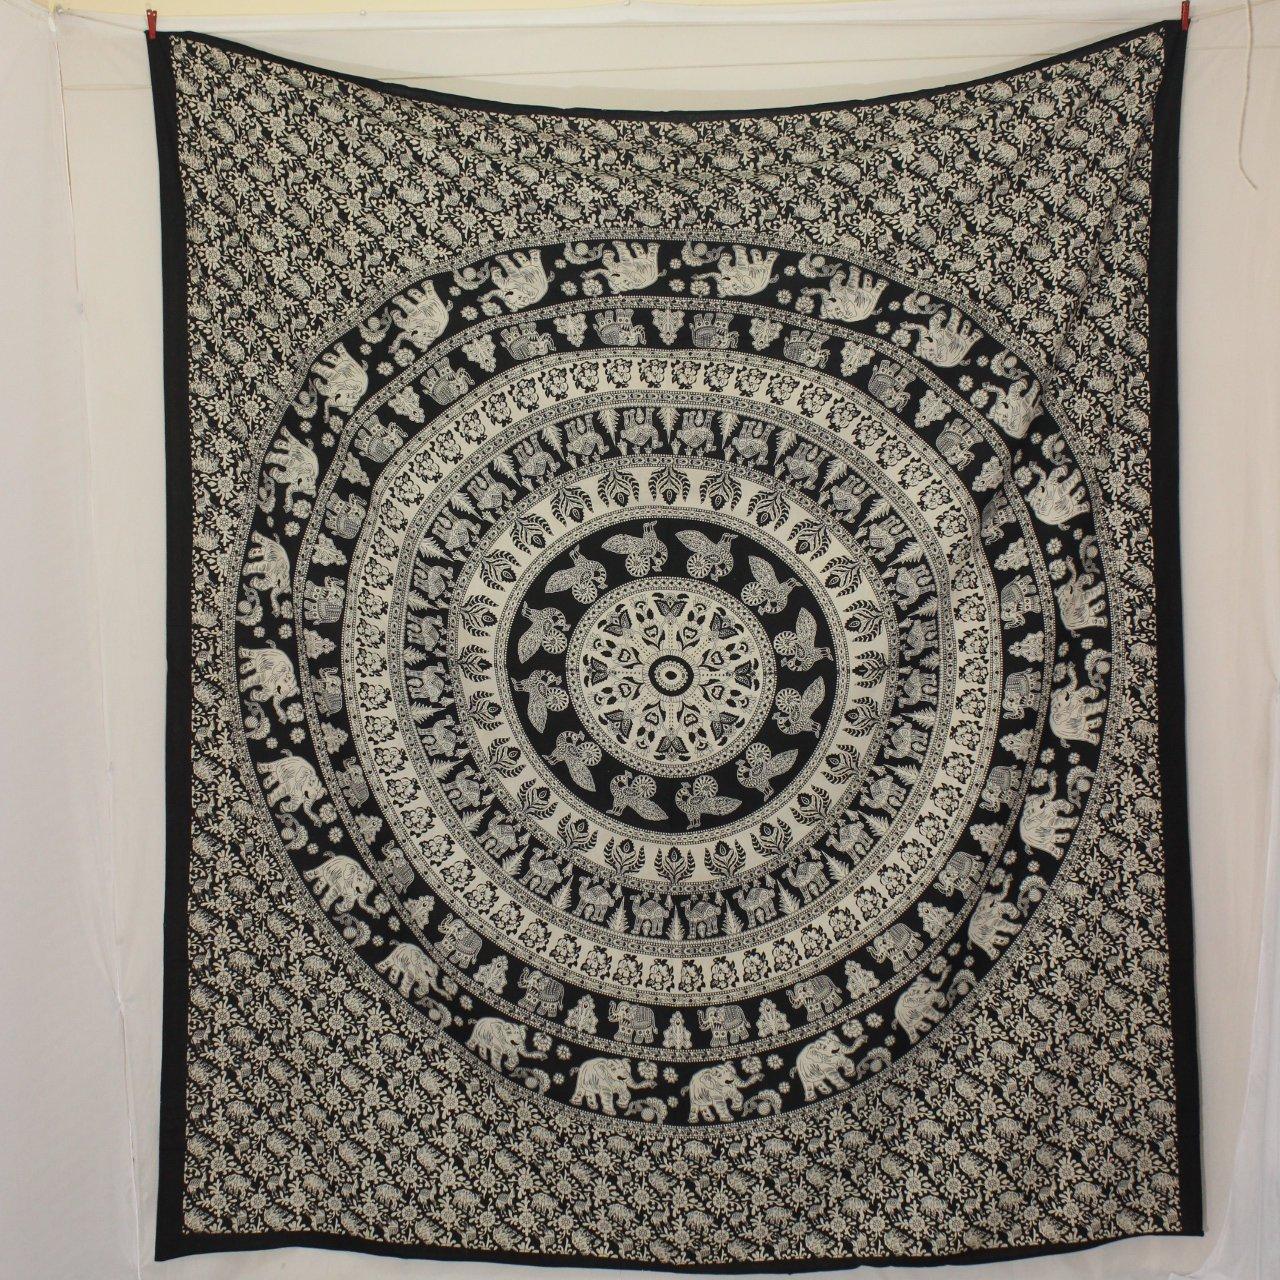 Elephant Tapestry Wall Hanging, Mandala Tapestry, wall Tapestry Black and white Indian Tapestry Dorm Bohemian Hippie Boho Wall Hanging decor